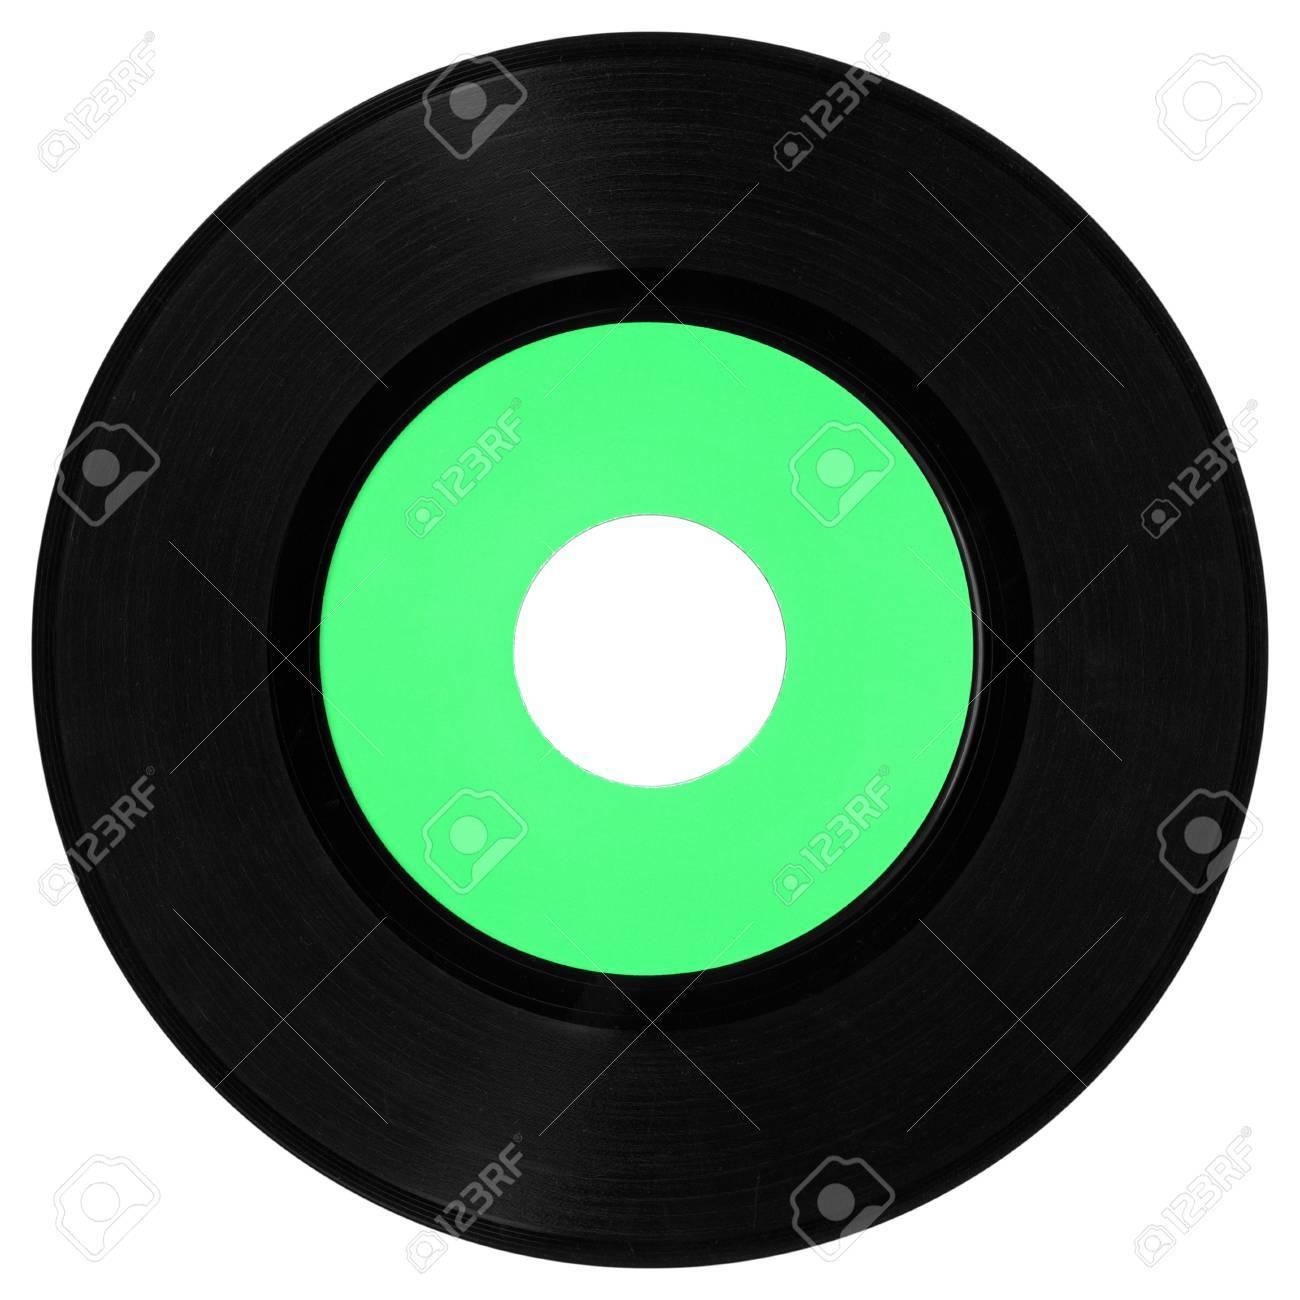 Vinyl record vintage analog music recording medium Stock Photo - 7575950